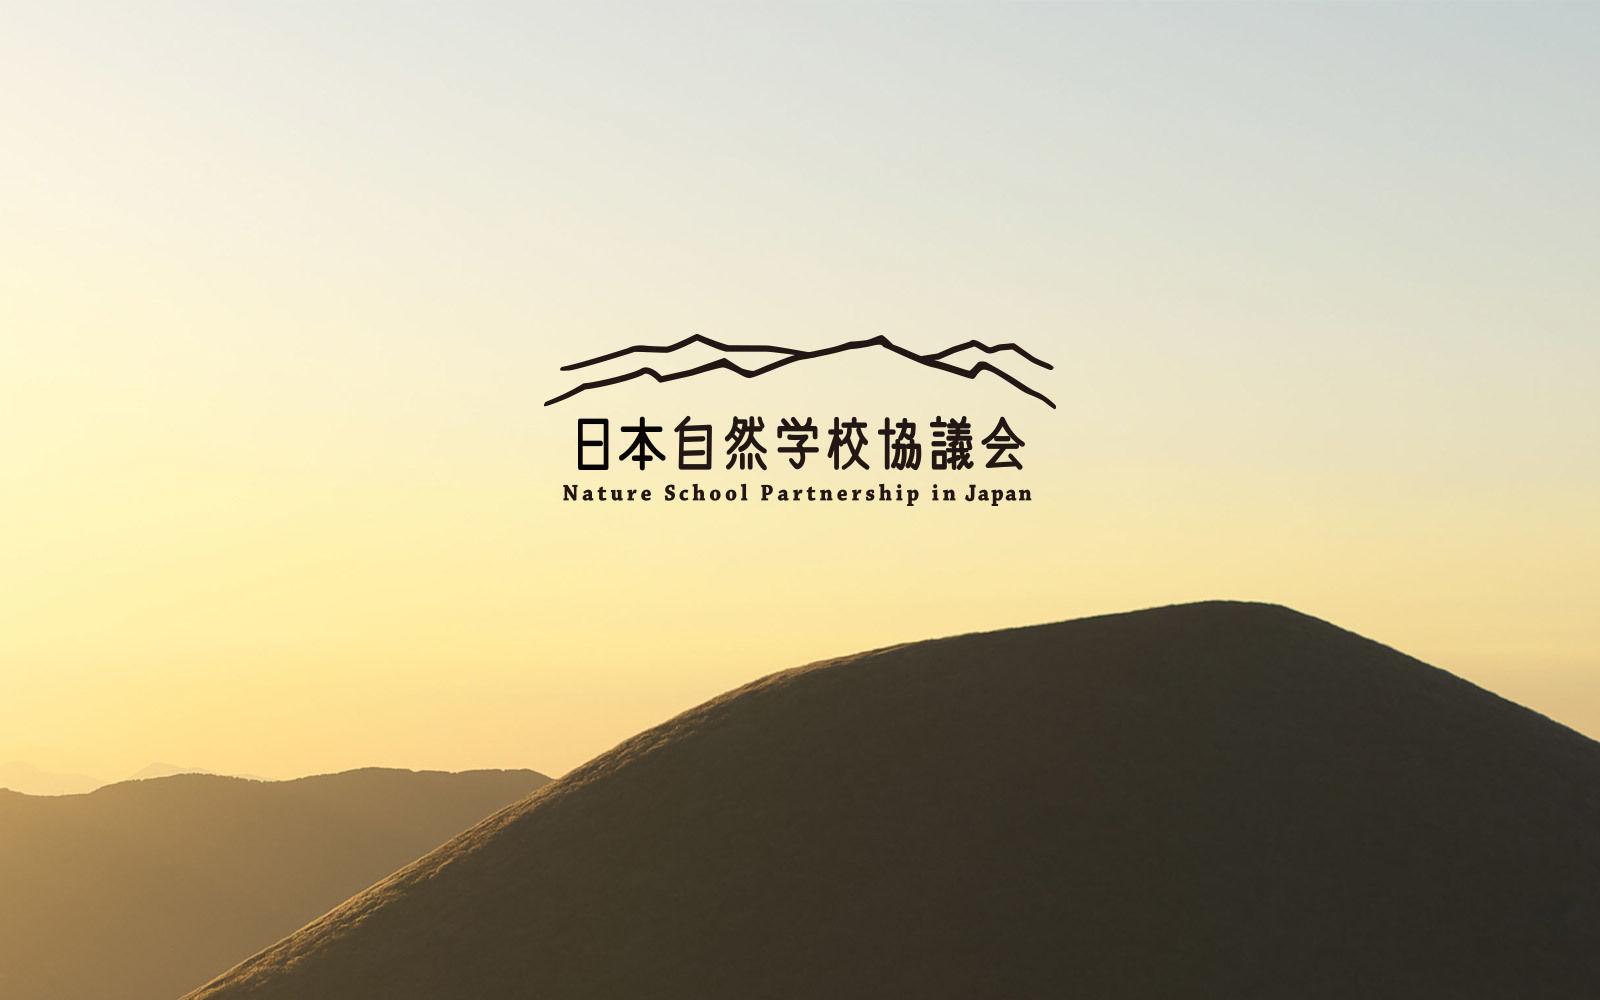 九州自然学校協議会ストア